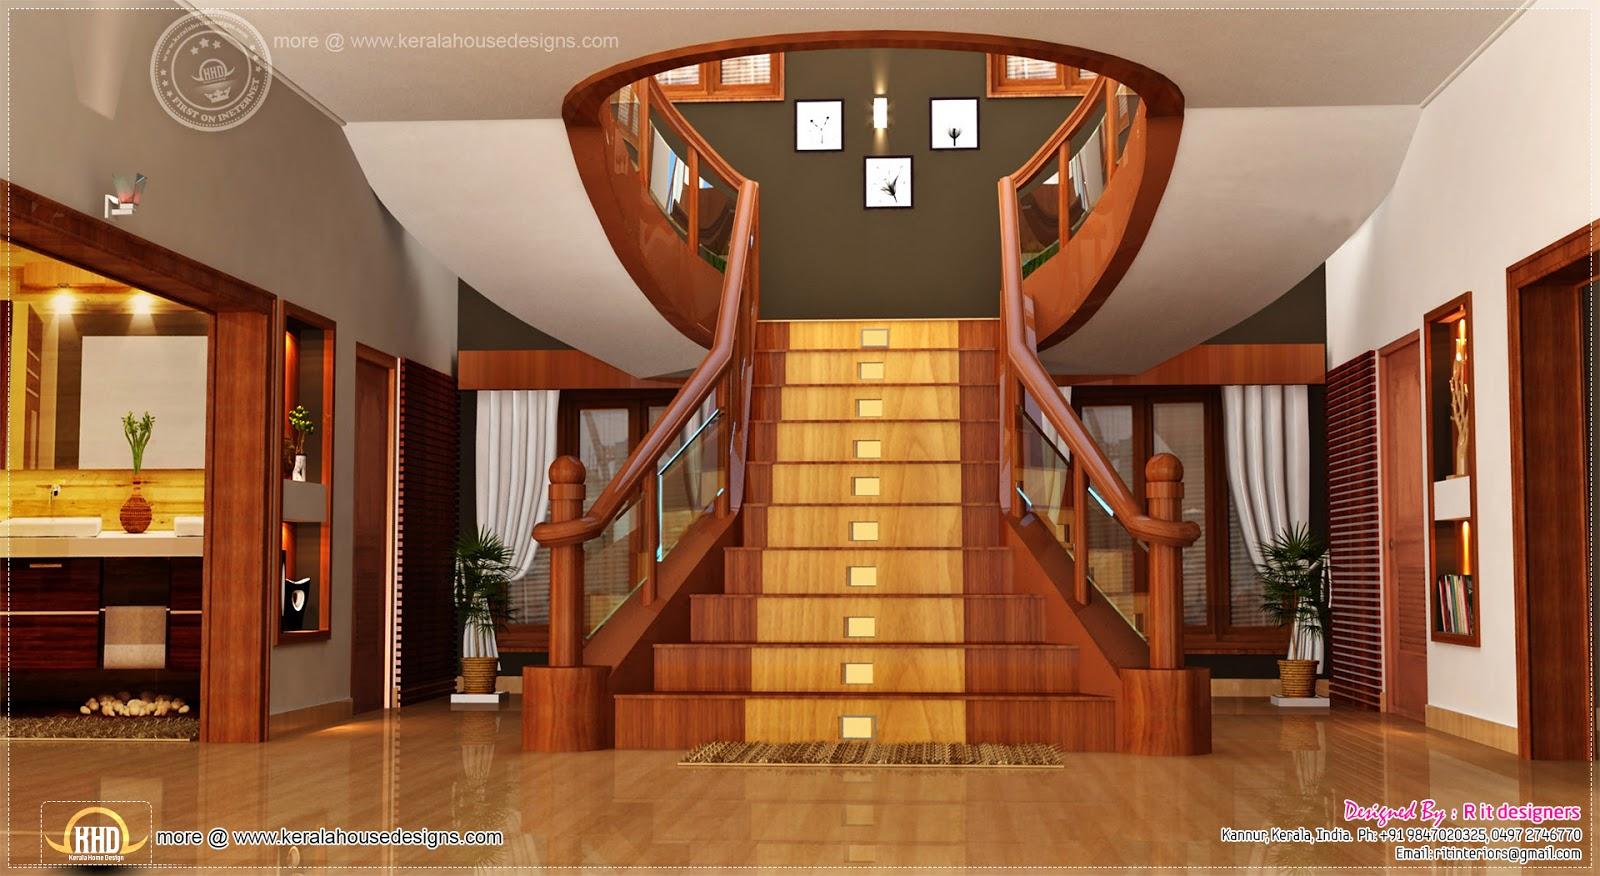 Home interior designs by Rit designers  Kerala home